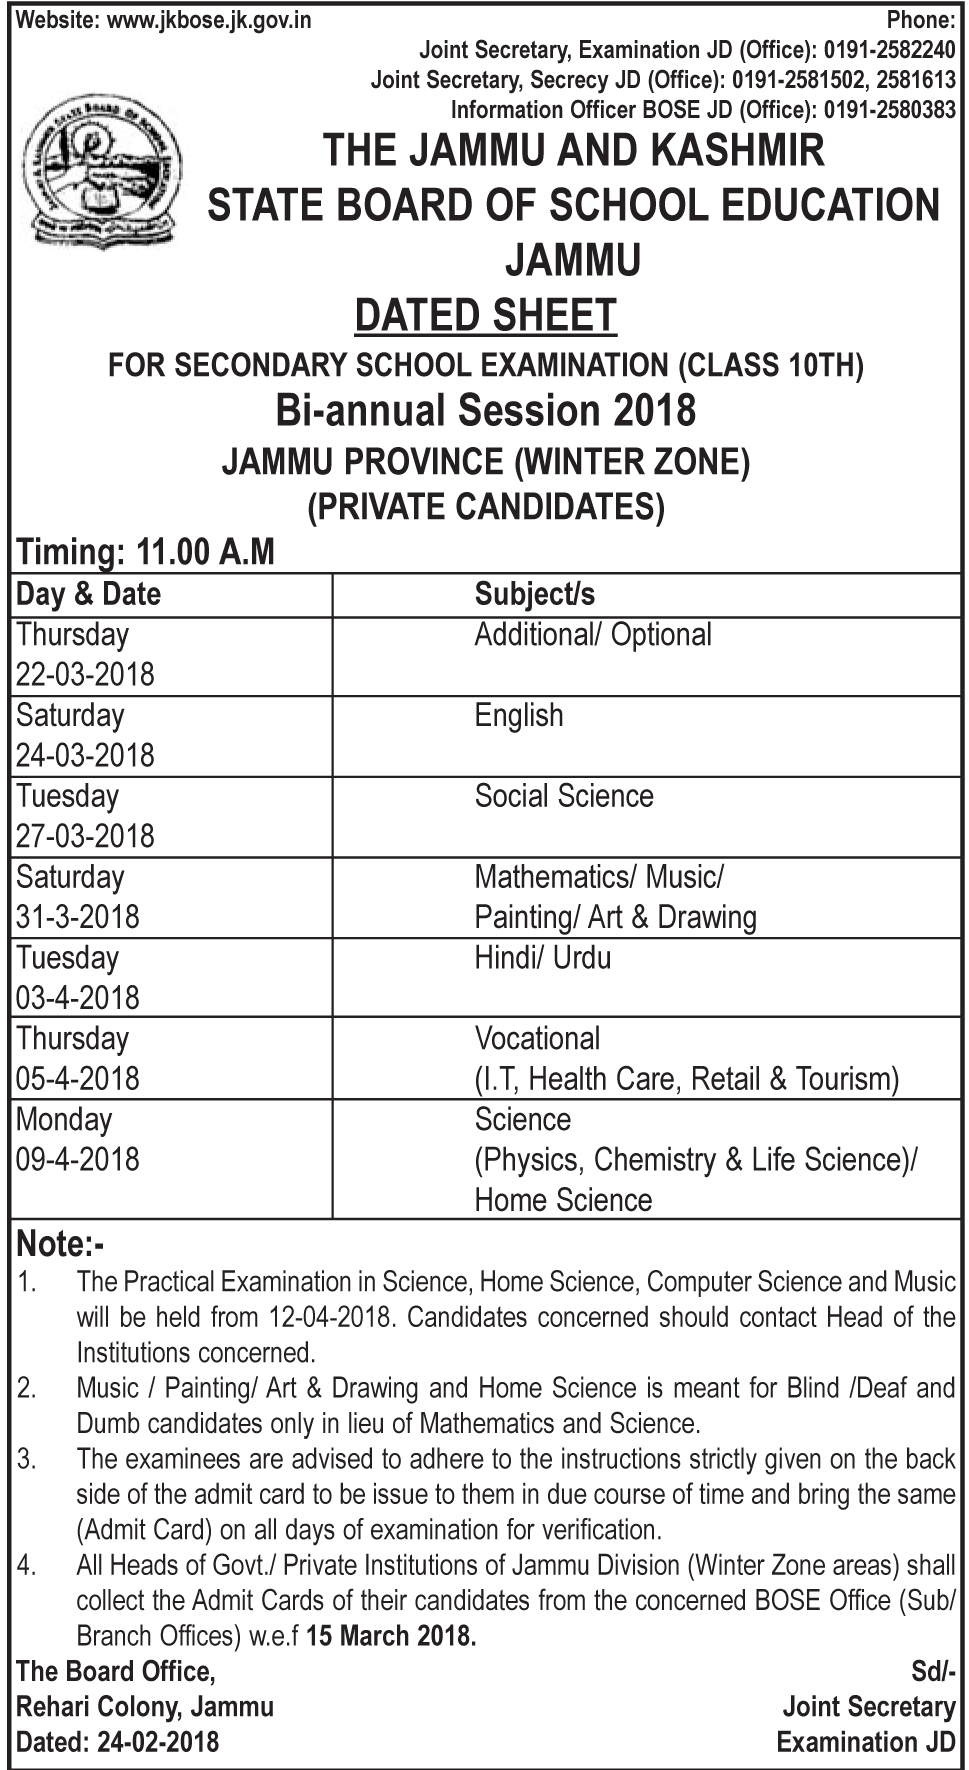 jkbose date sheet class 10th jammu province winter zone bi. Black Bedroom Furniture Sets. Home Design Ideas